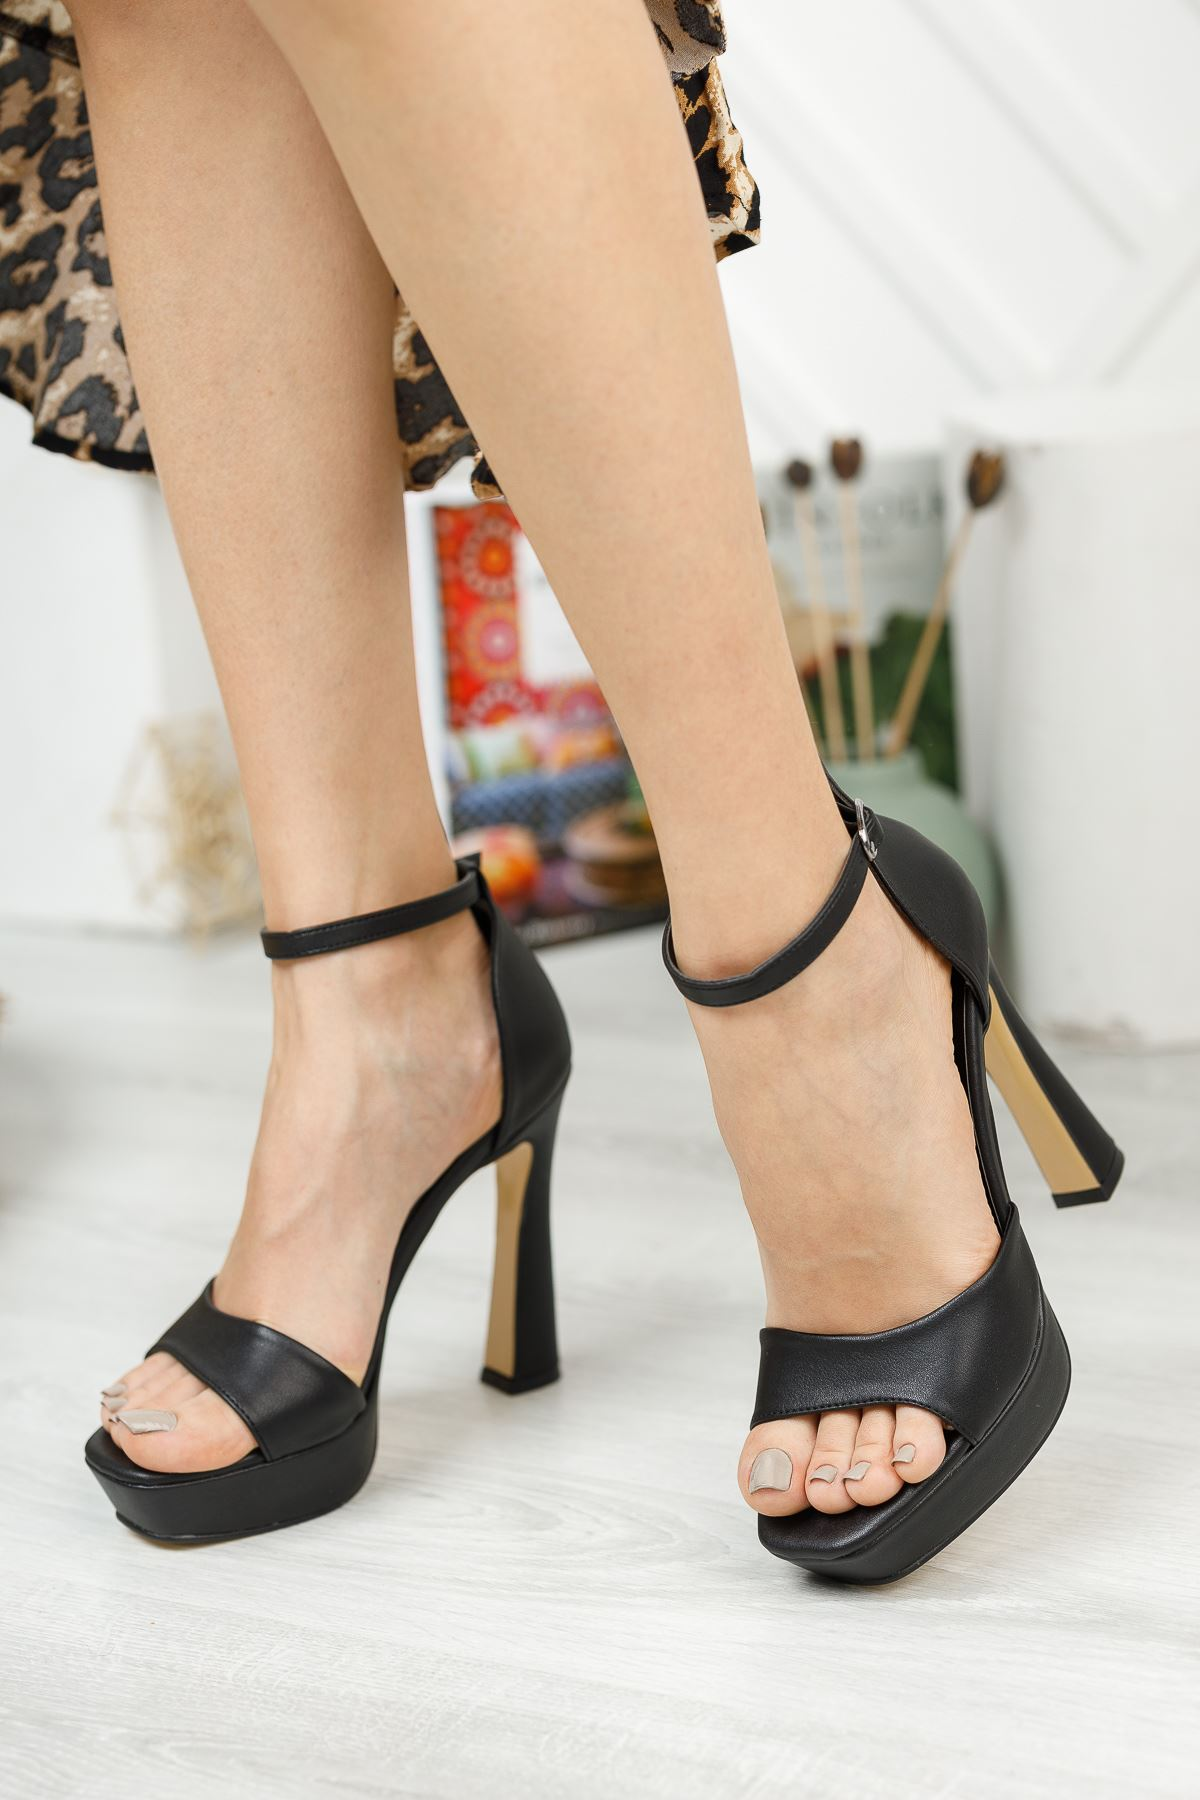 Düz Siyah Tek Bant Yüksek Platform Topuklu Ayakkabı